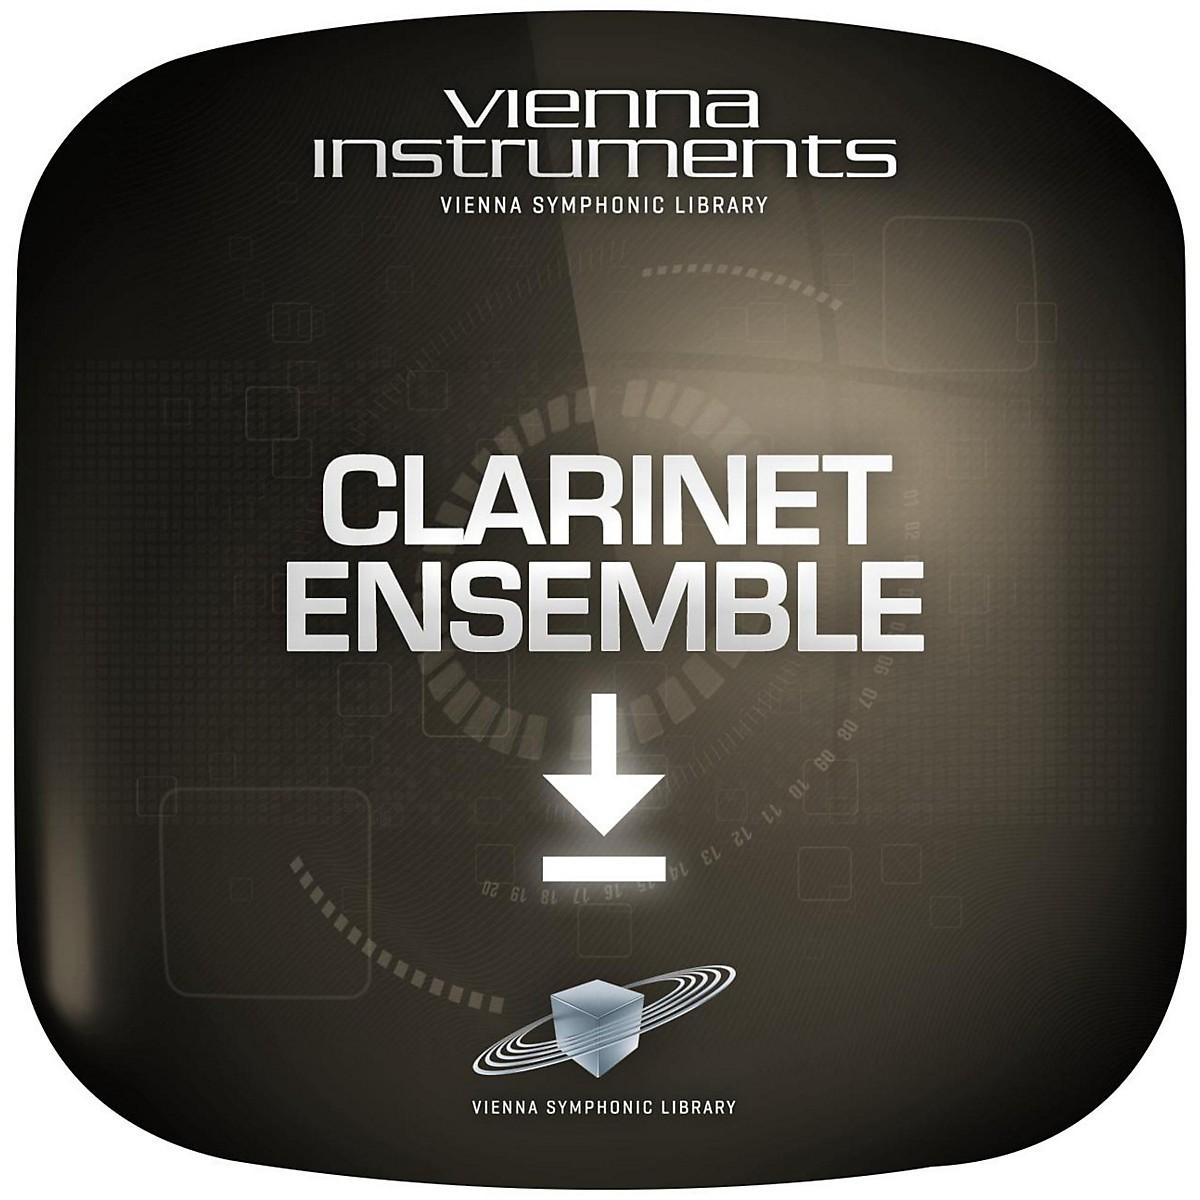 Vienna Instruments Clarinet Ensemble Upgrade To Full Library